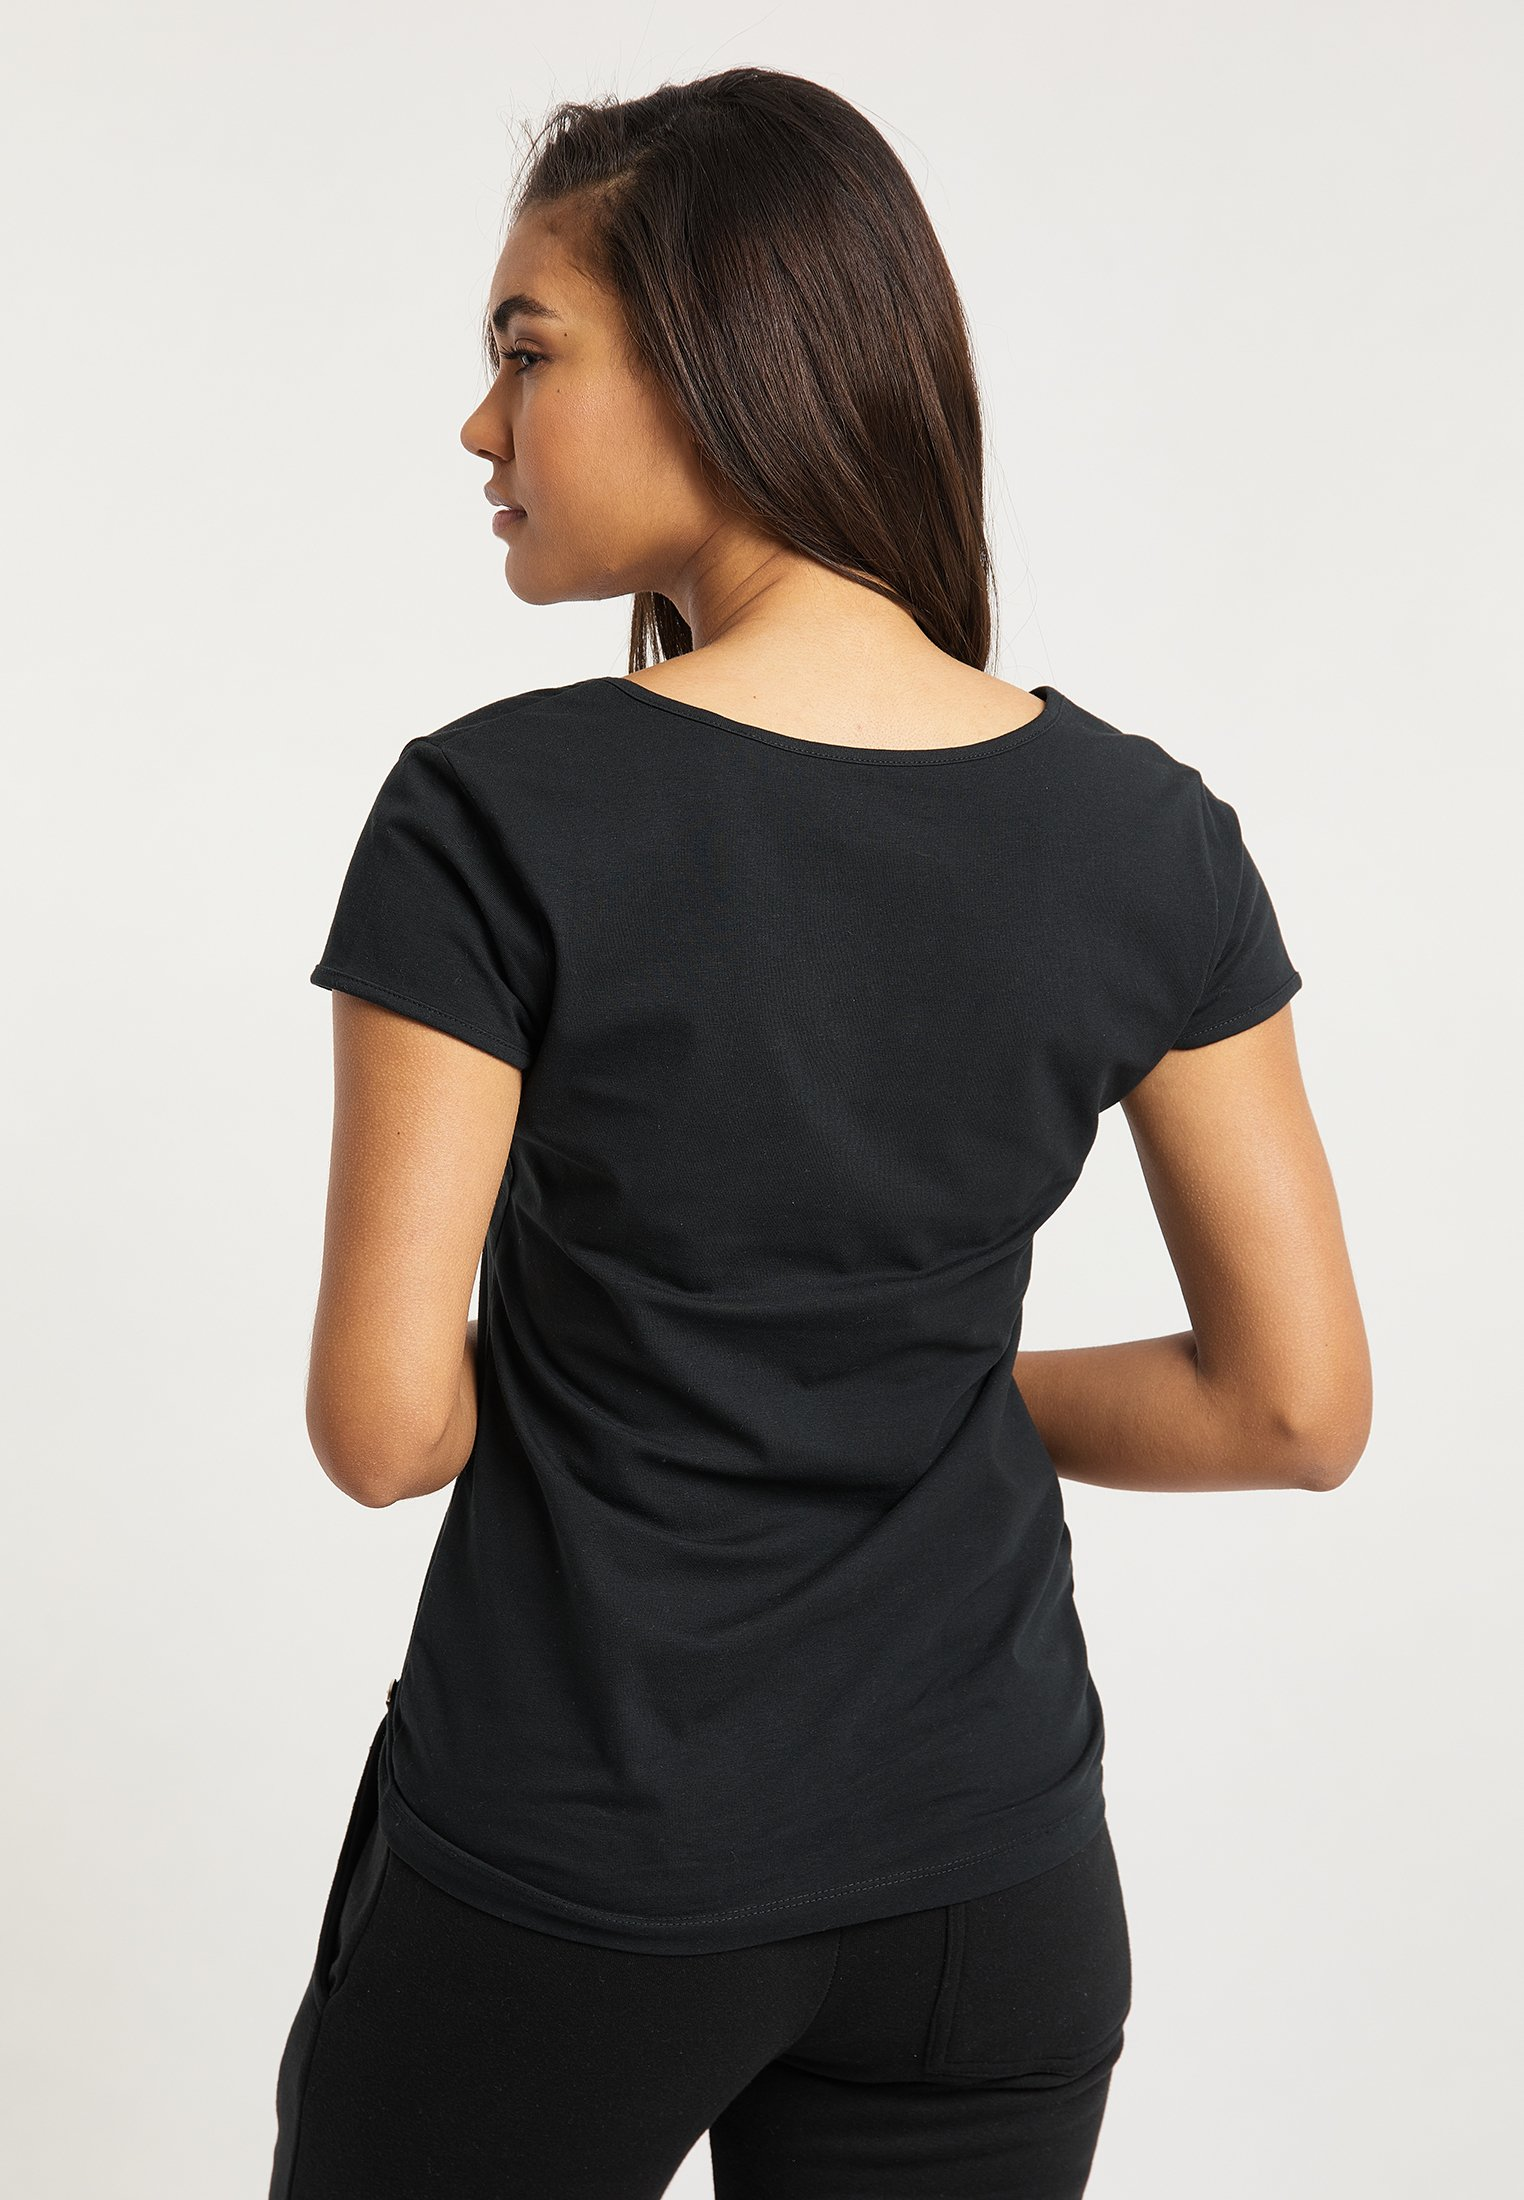 Bruno Banani T-shirt imprimé - schwarz - Tops & T-shirts Femme Wv4S2